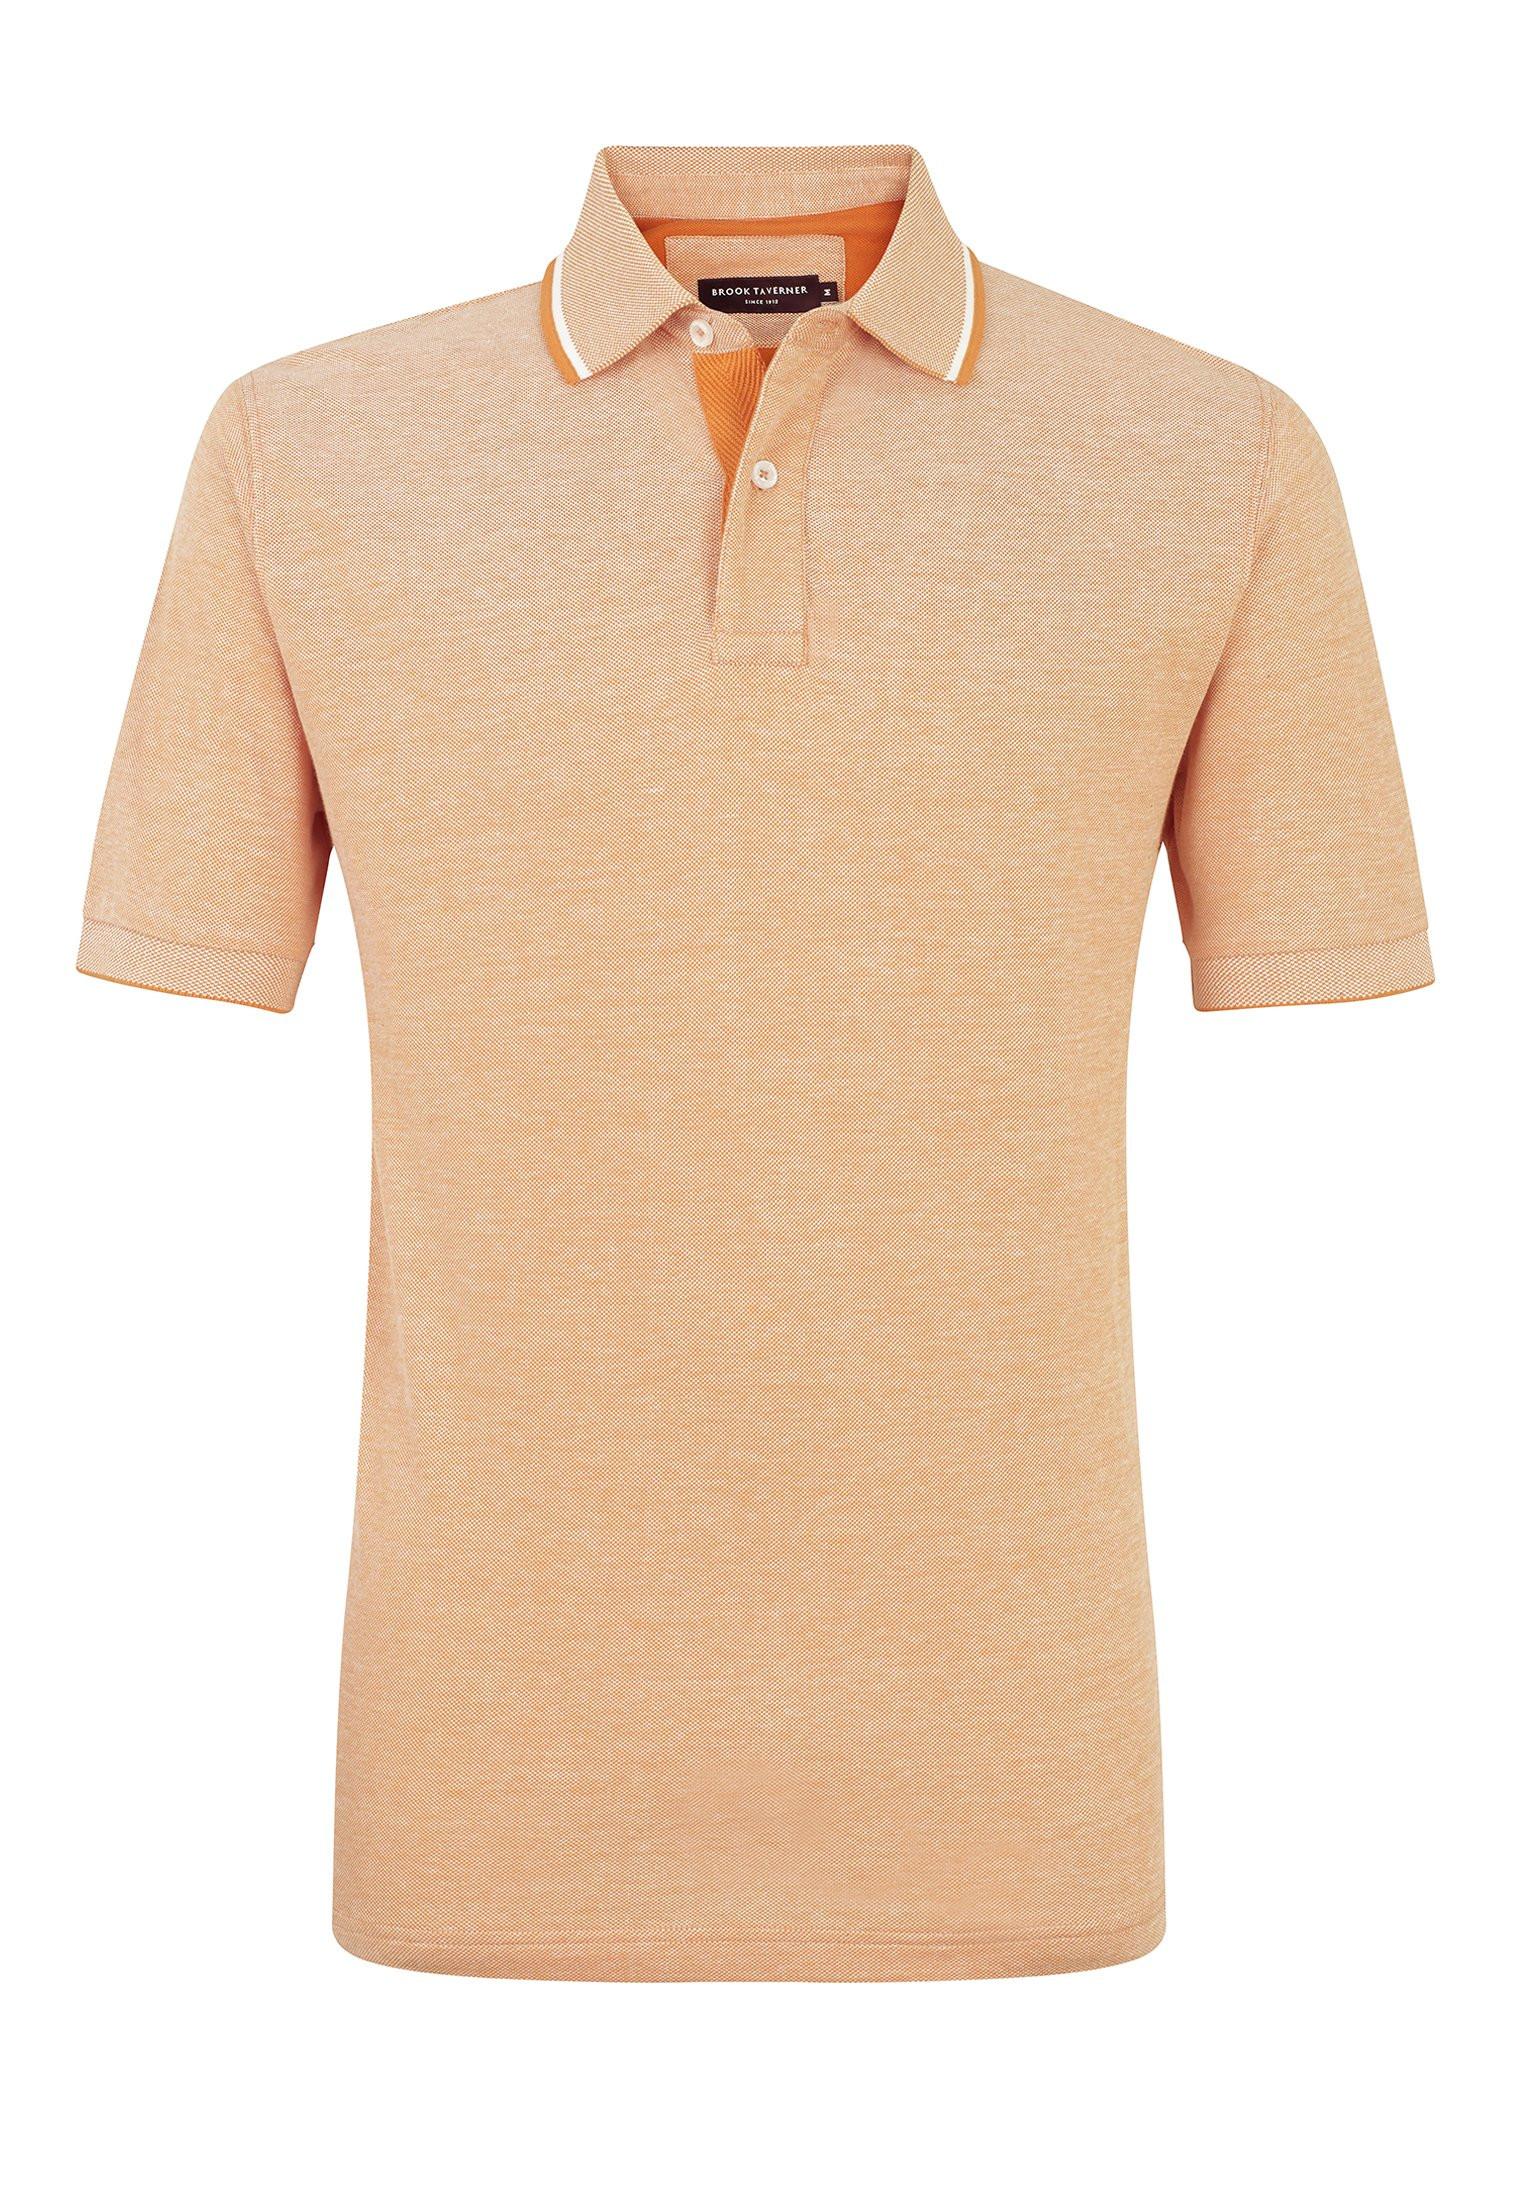 Apricot Menston 100% Cotton Pique Polo Shirt